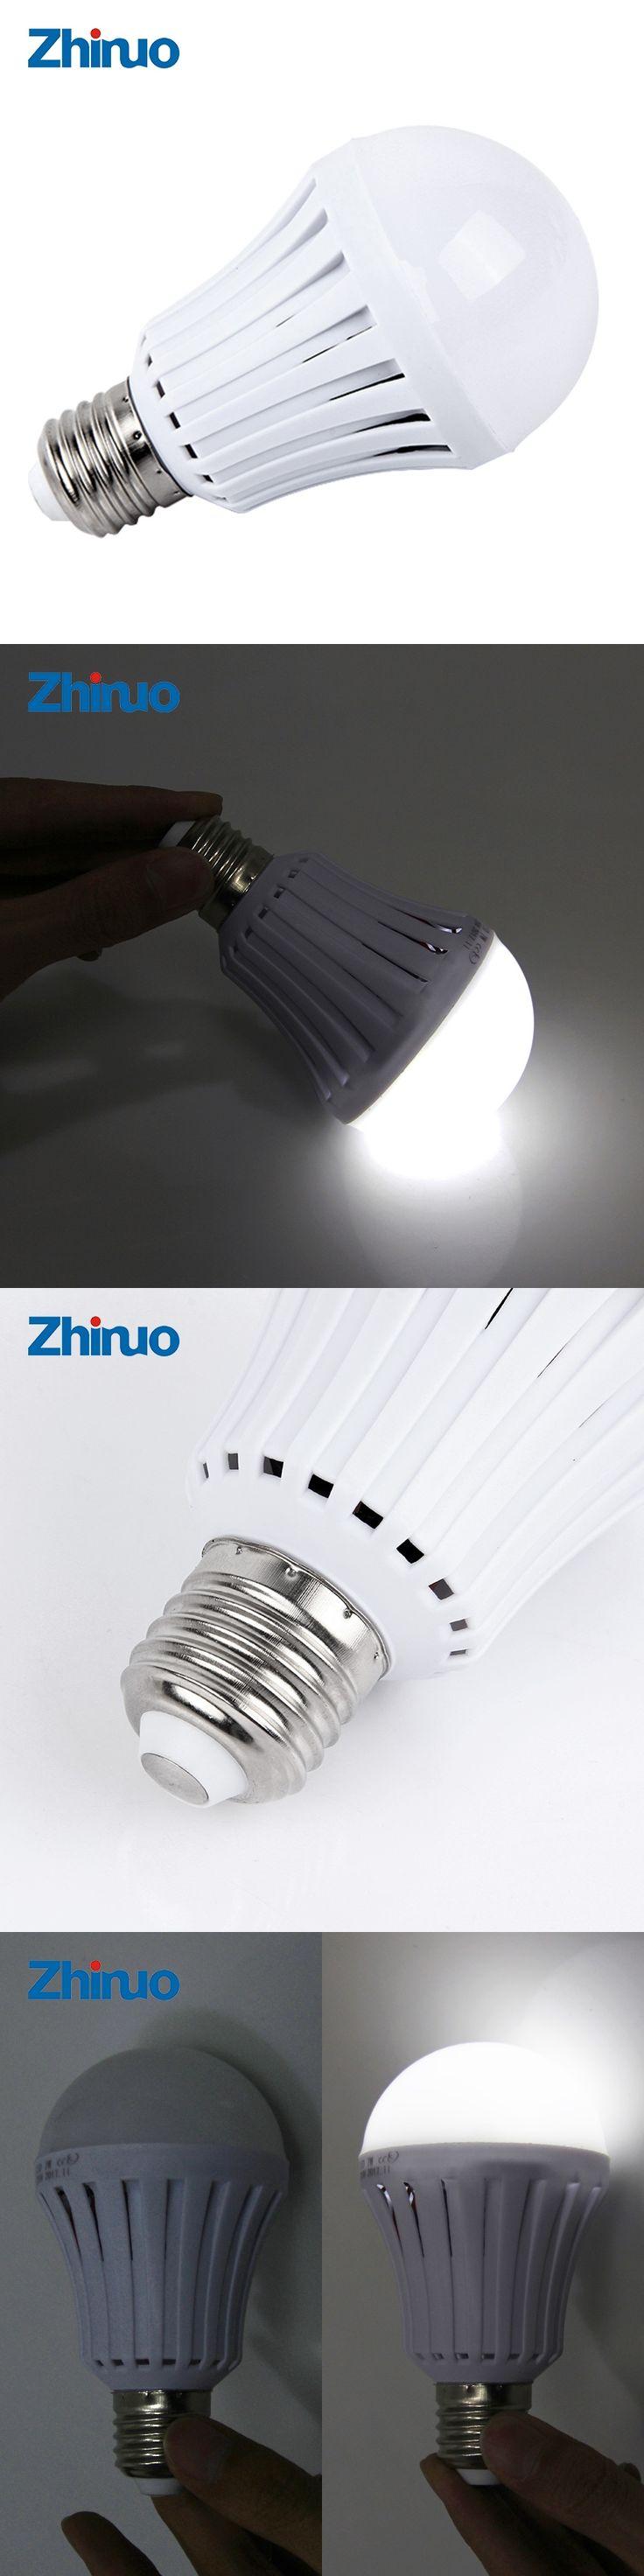 Zhinuo 220V Energy Saving E27 LED Bulb Lights LED Lamp 5W 7W 9W 12W Lamparas LED Light Bulbs Living Room Outdoor lighting